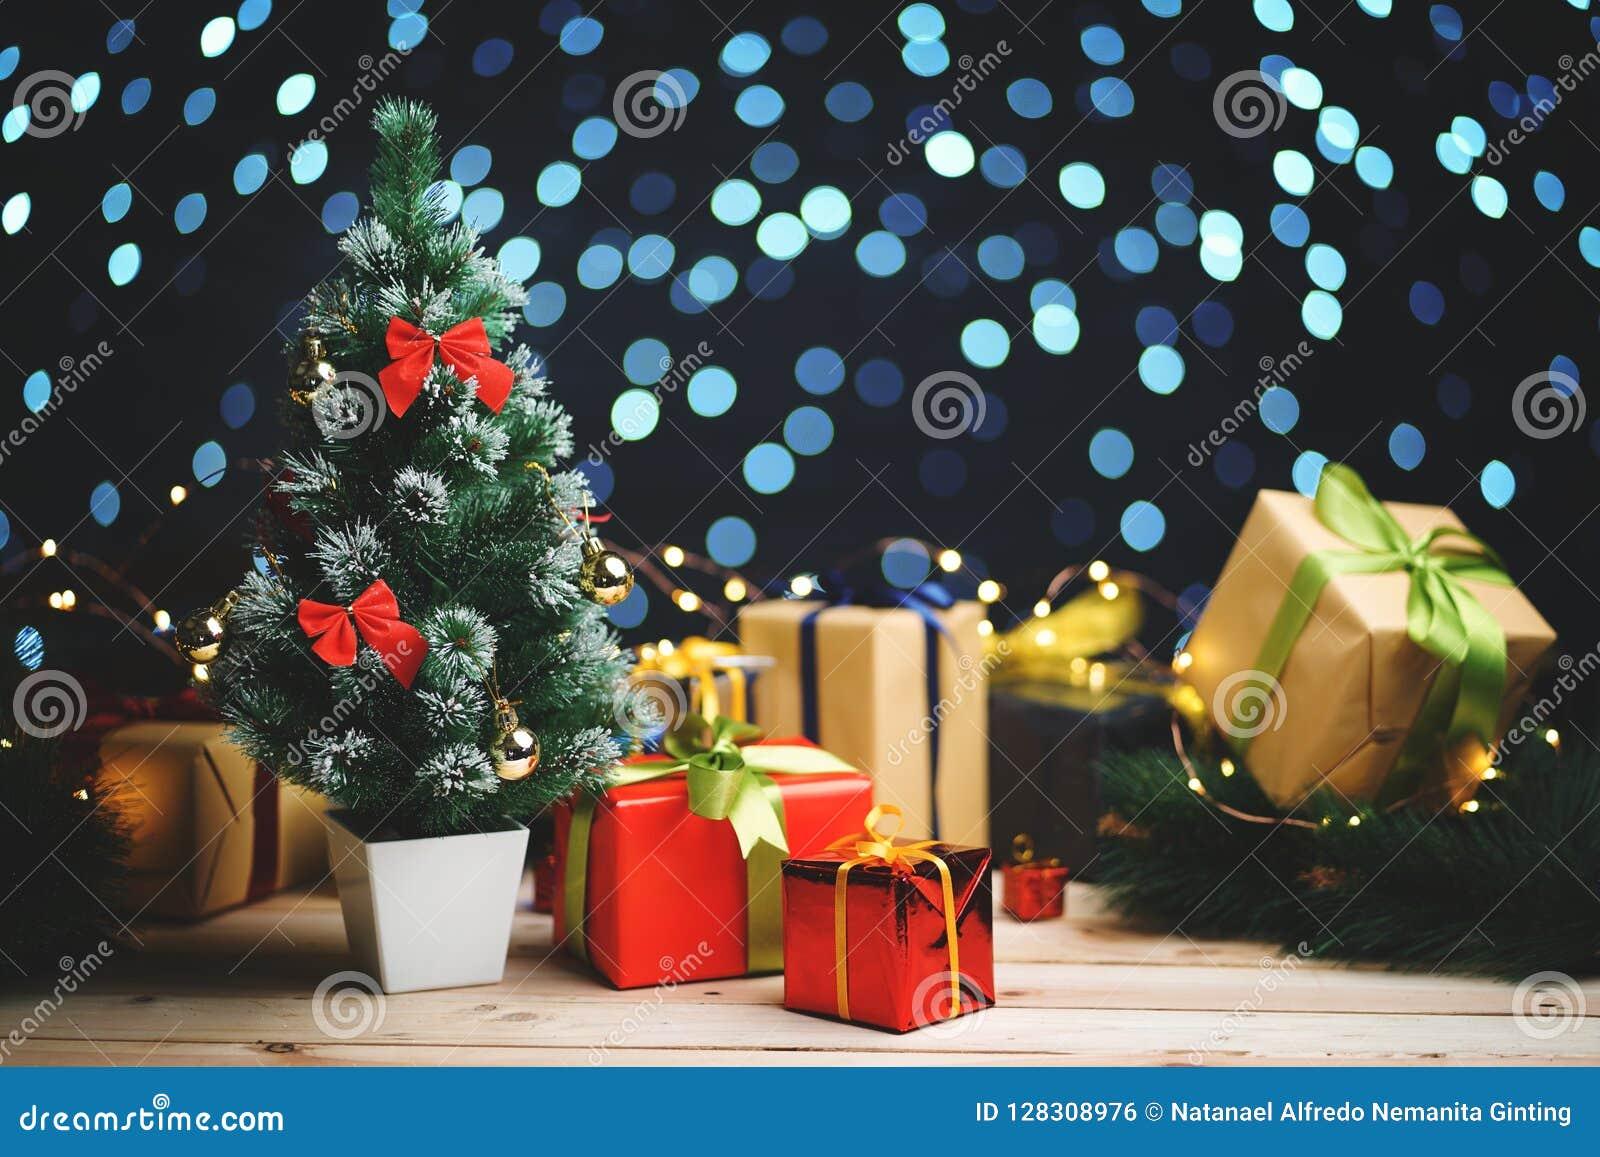 Small Christmas Tree Between Christmas Presents Against Beautifull Blue Lights Bokeh